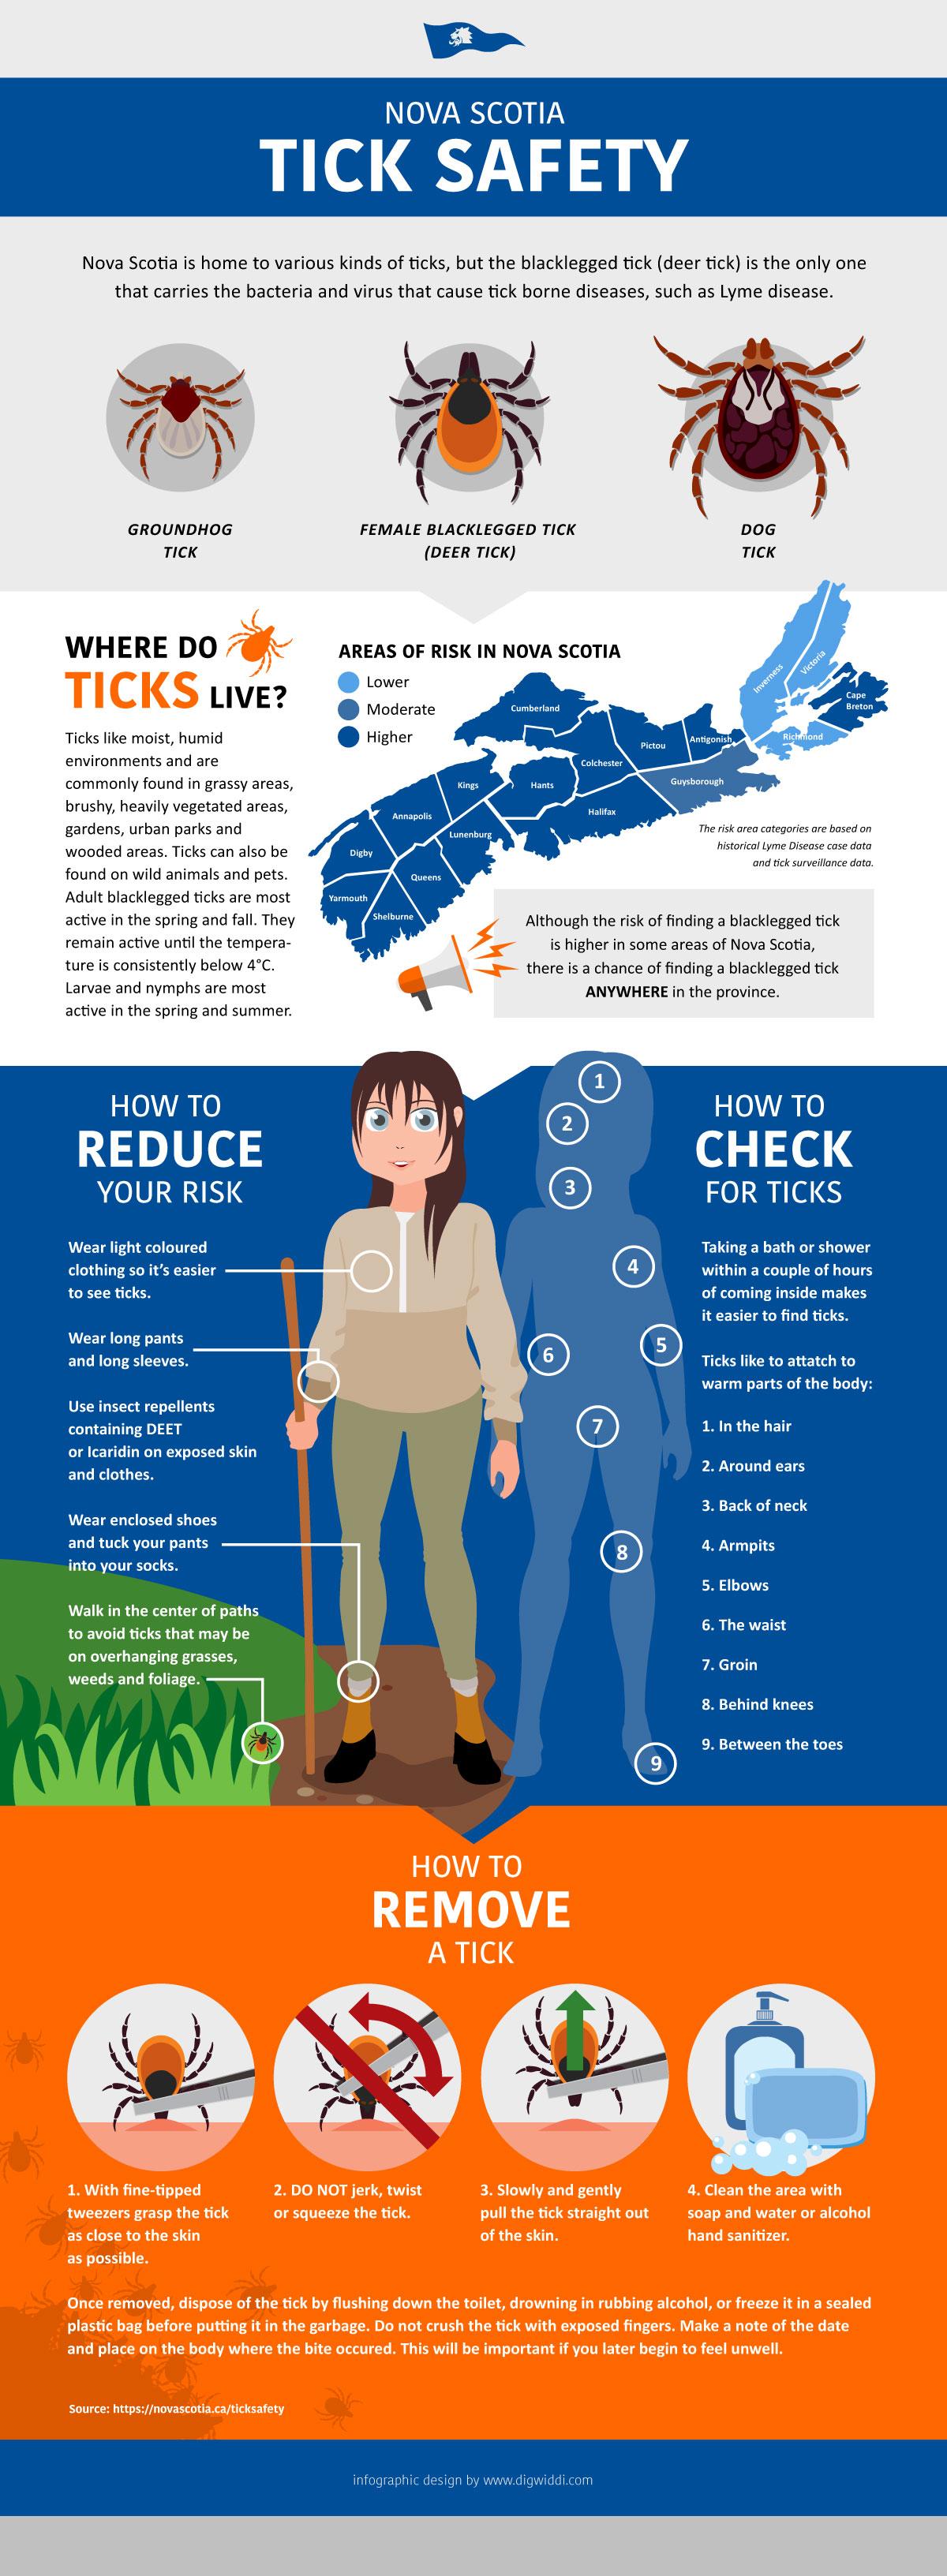 Nova Scotia Tick Safety Infographic